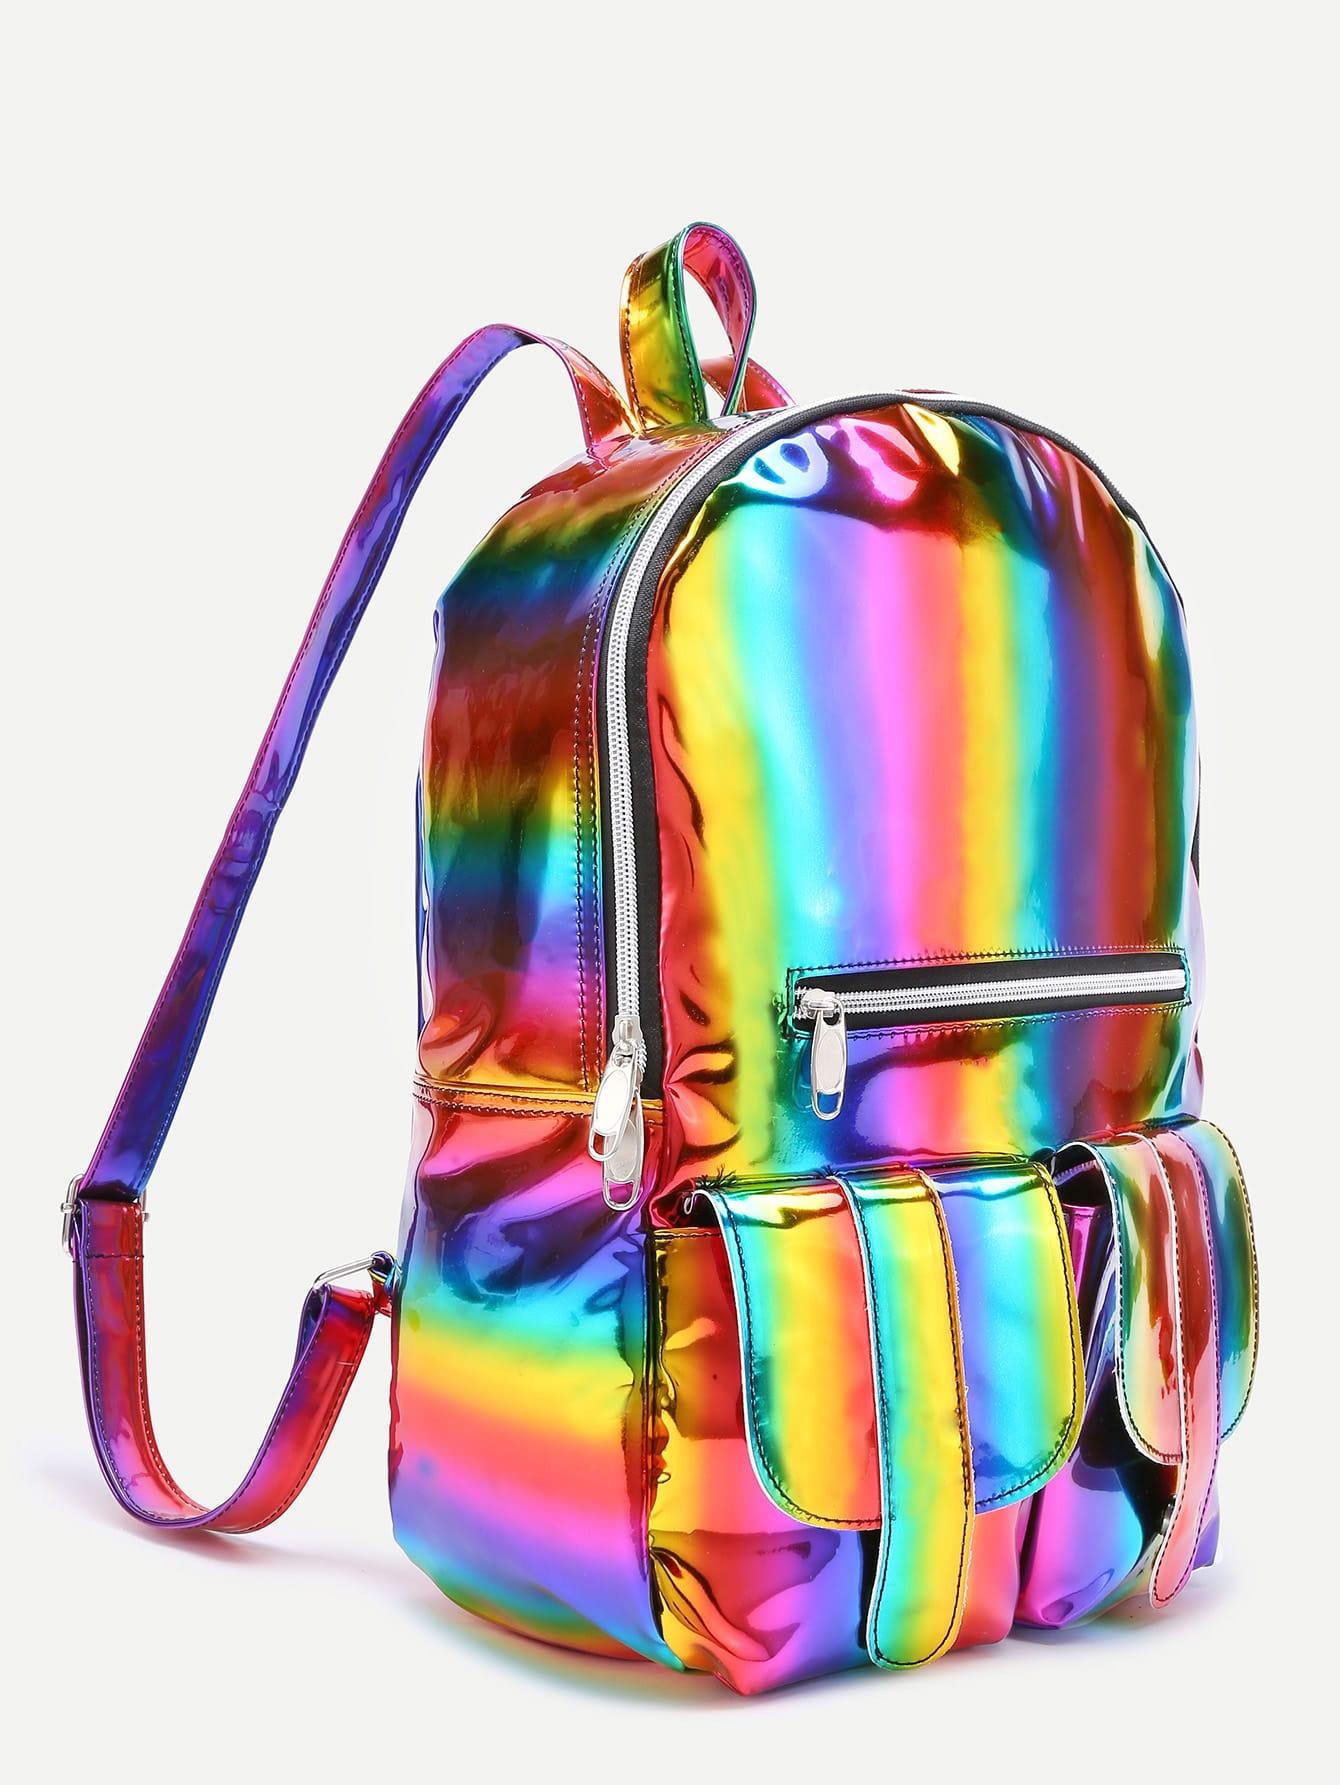 bag170410910_1